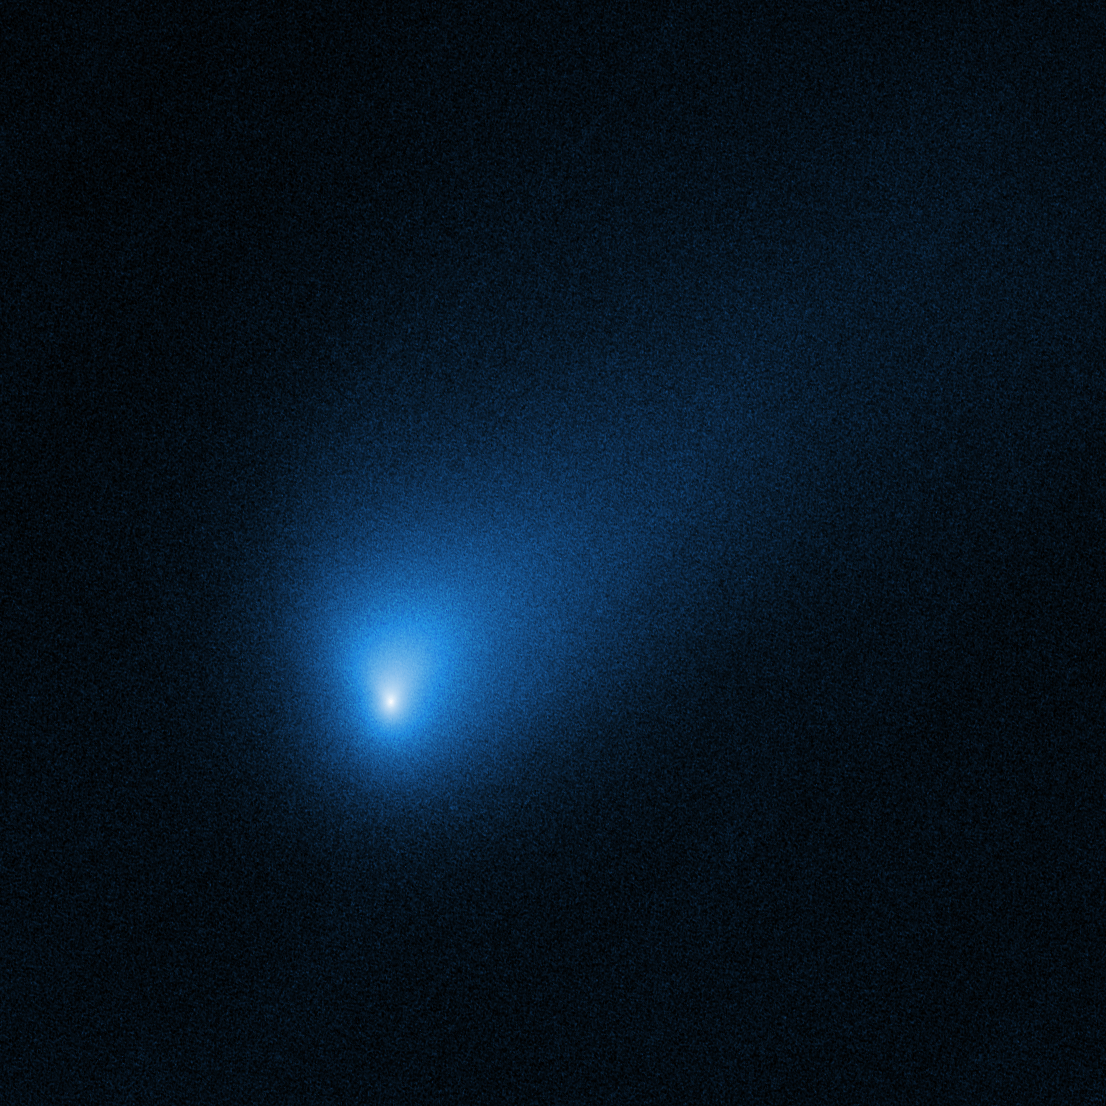 2I/Borisov, seen by Hubble.